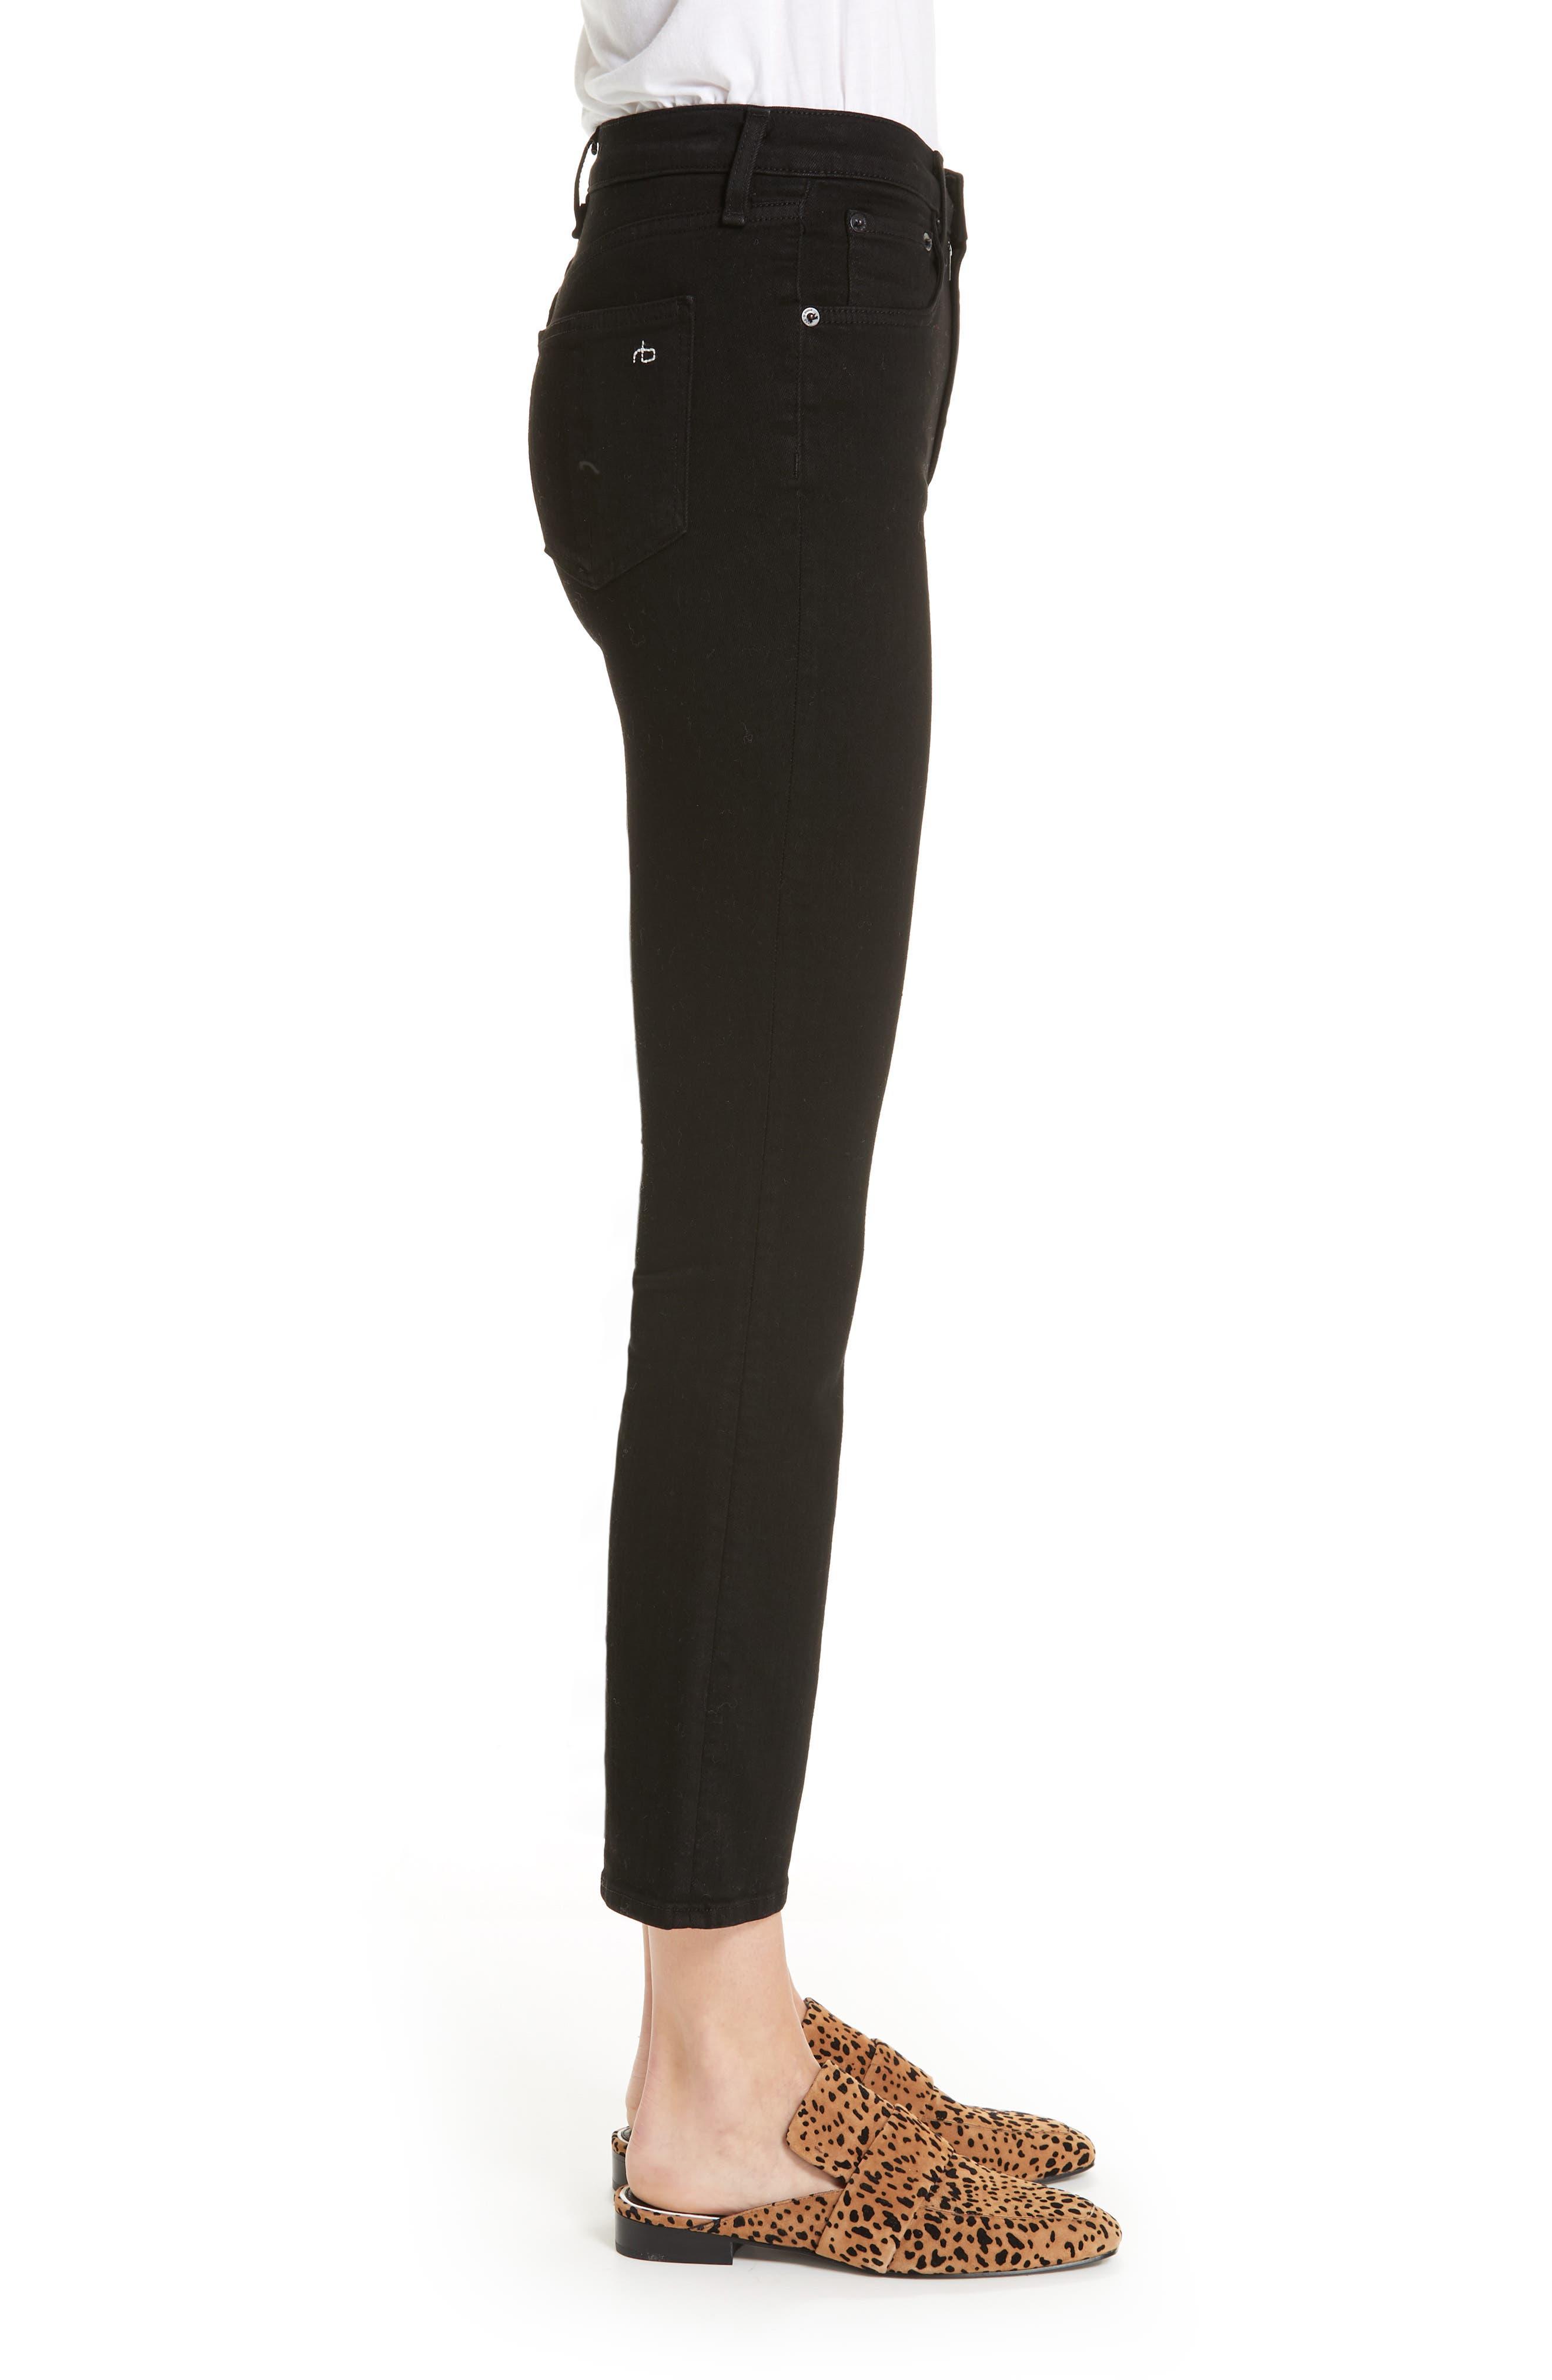 RAG & BONE,                             Hana High Waist Ankle Flare Jeans,                             Alternate thumbnail 3, color,                             001